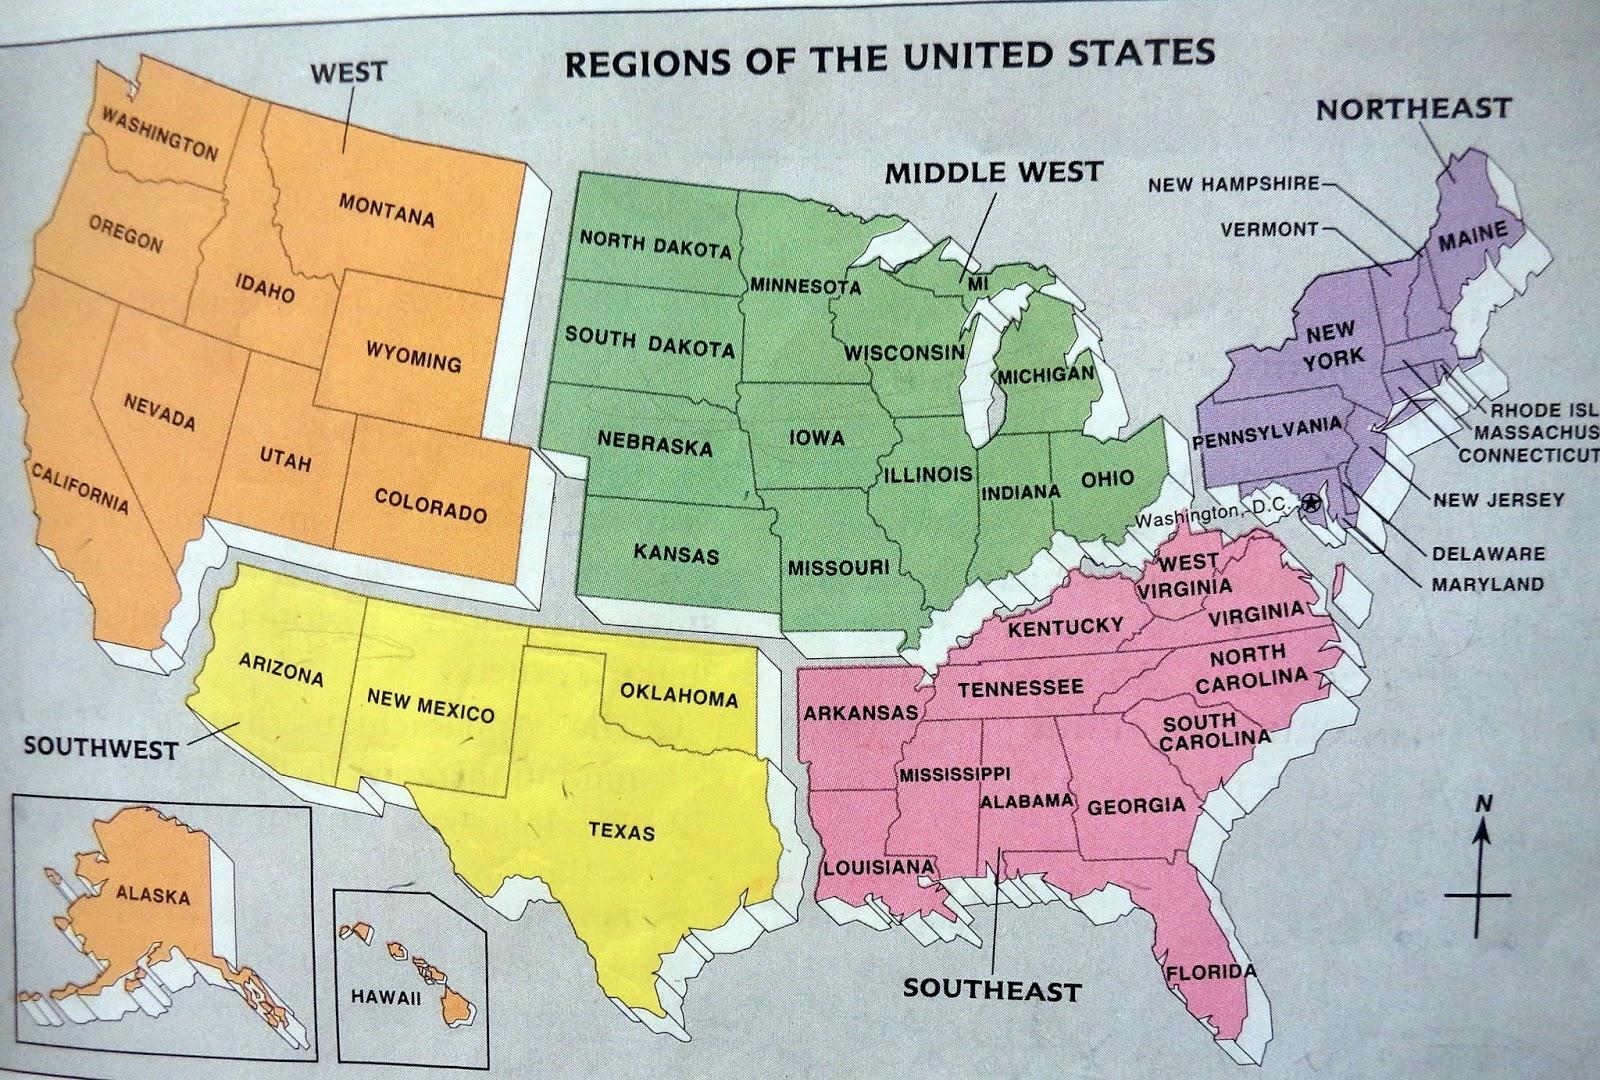 aplacians Kentucky Hidta Map Picture Kentucky Hidta